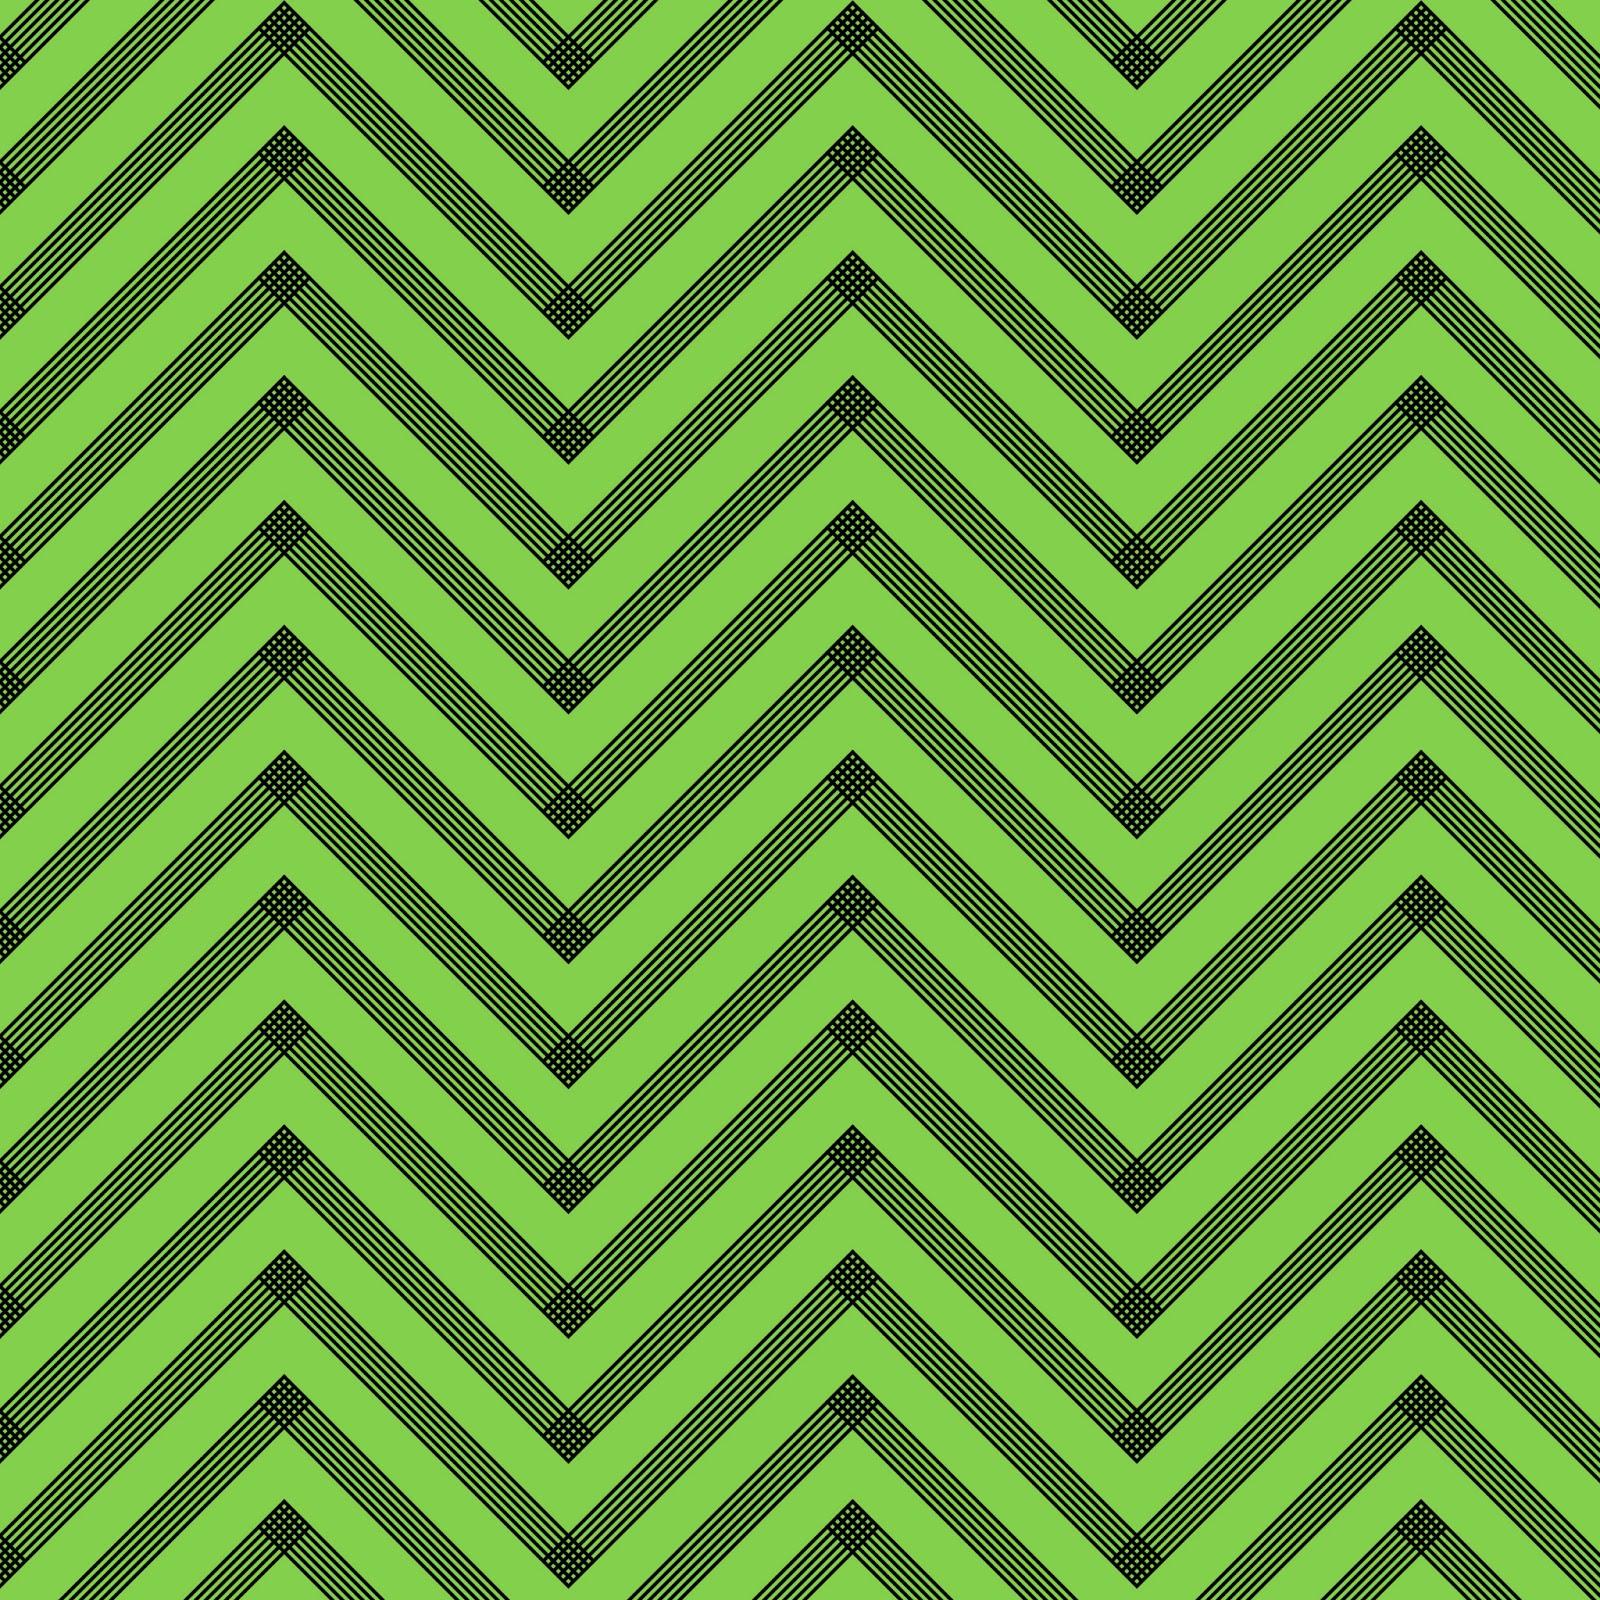 Mint Green Chevron Wallpaper - WallpaperSafari